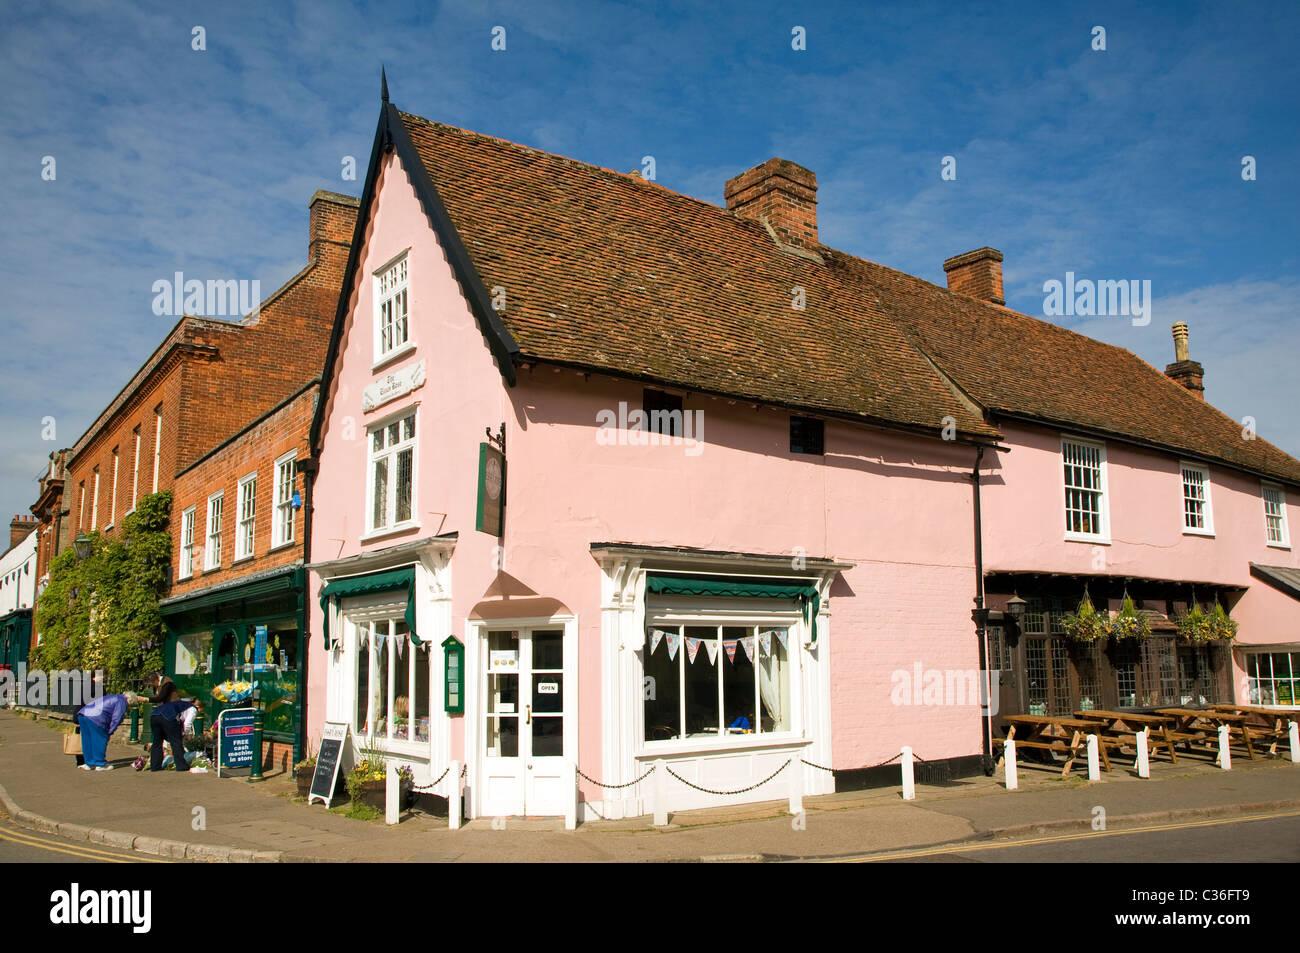 The Essex Rose tearoom Dedham Essex England - Stock Image